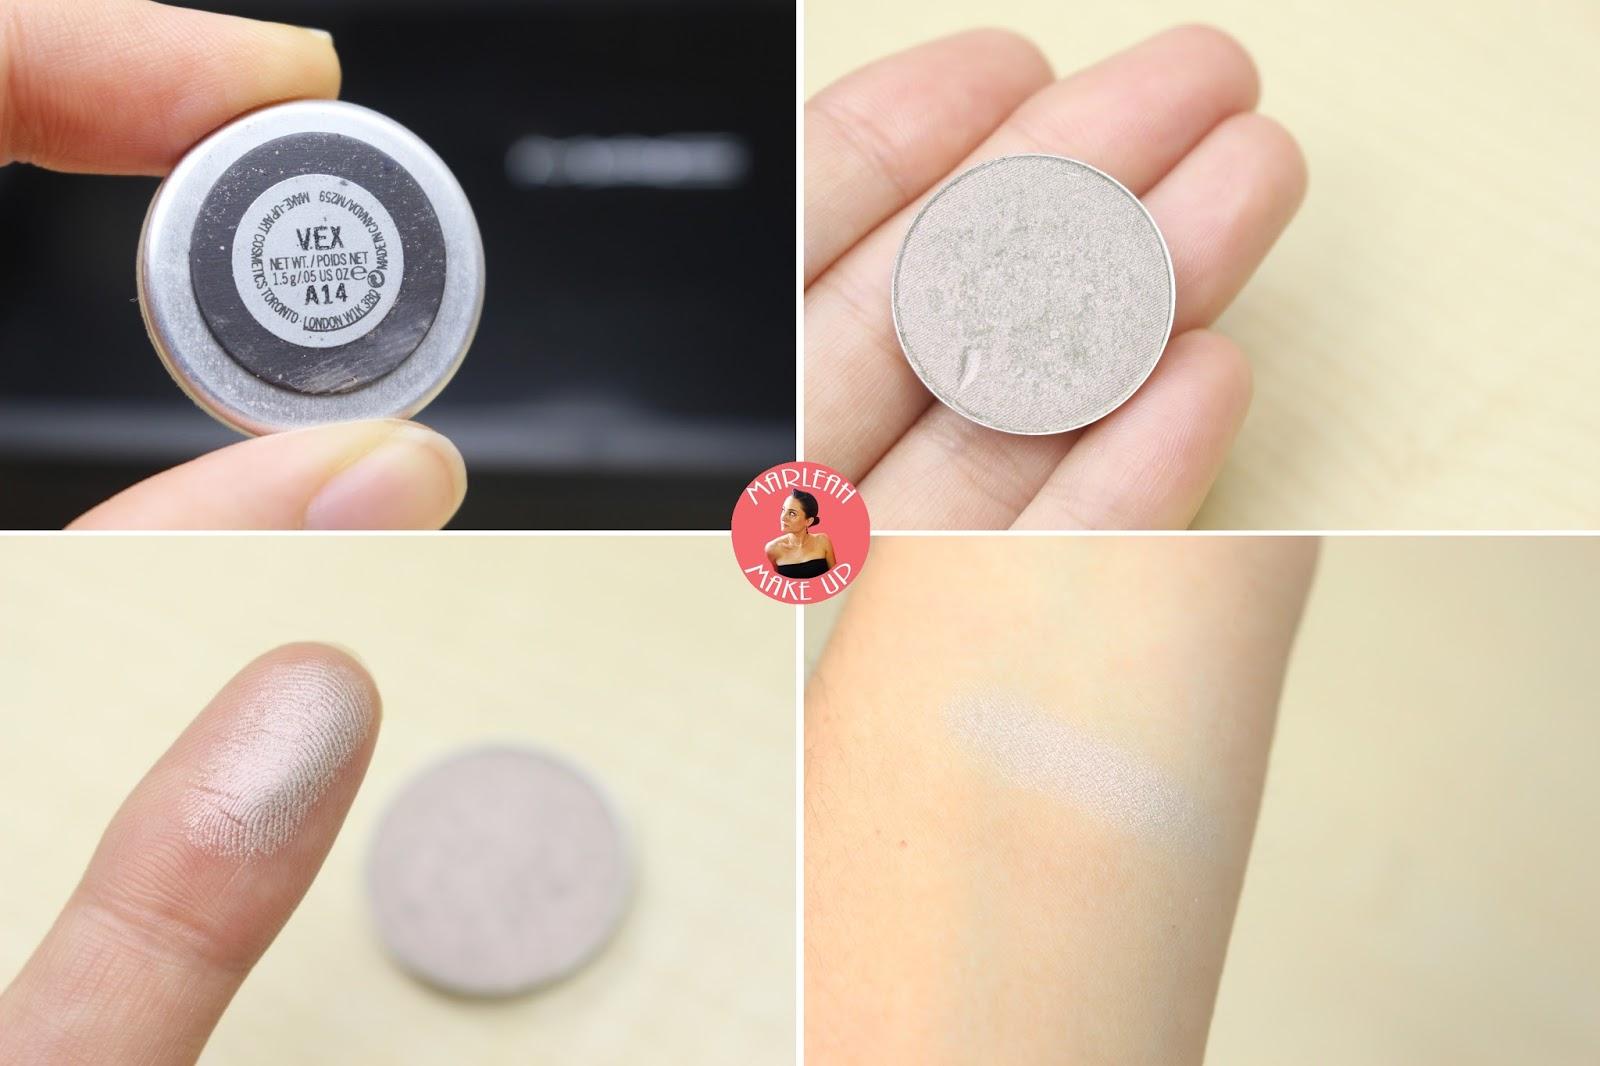 sombras eyeshadow MAC vex makeup palette godet